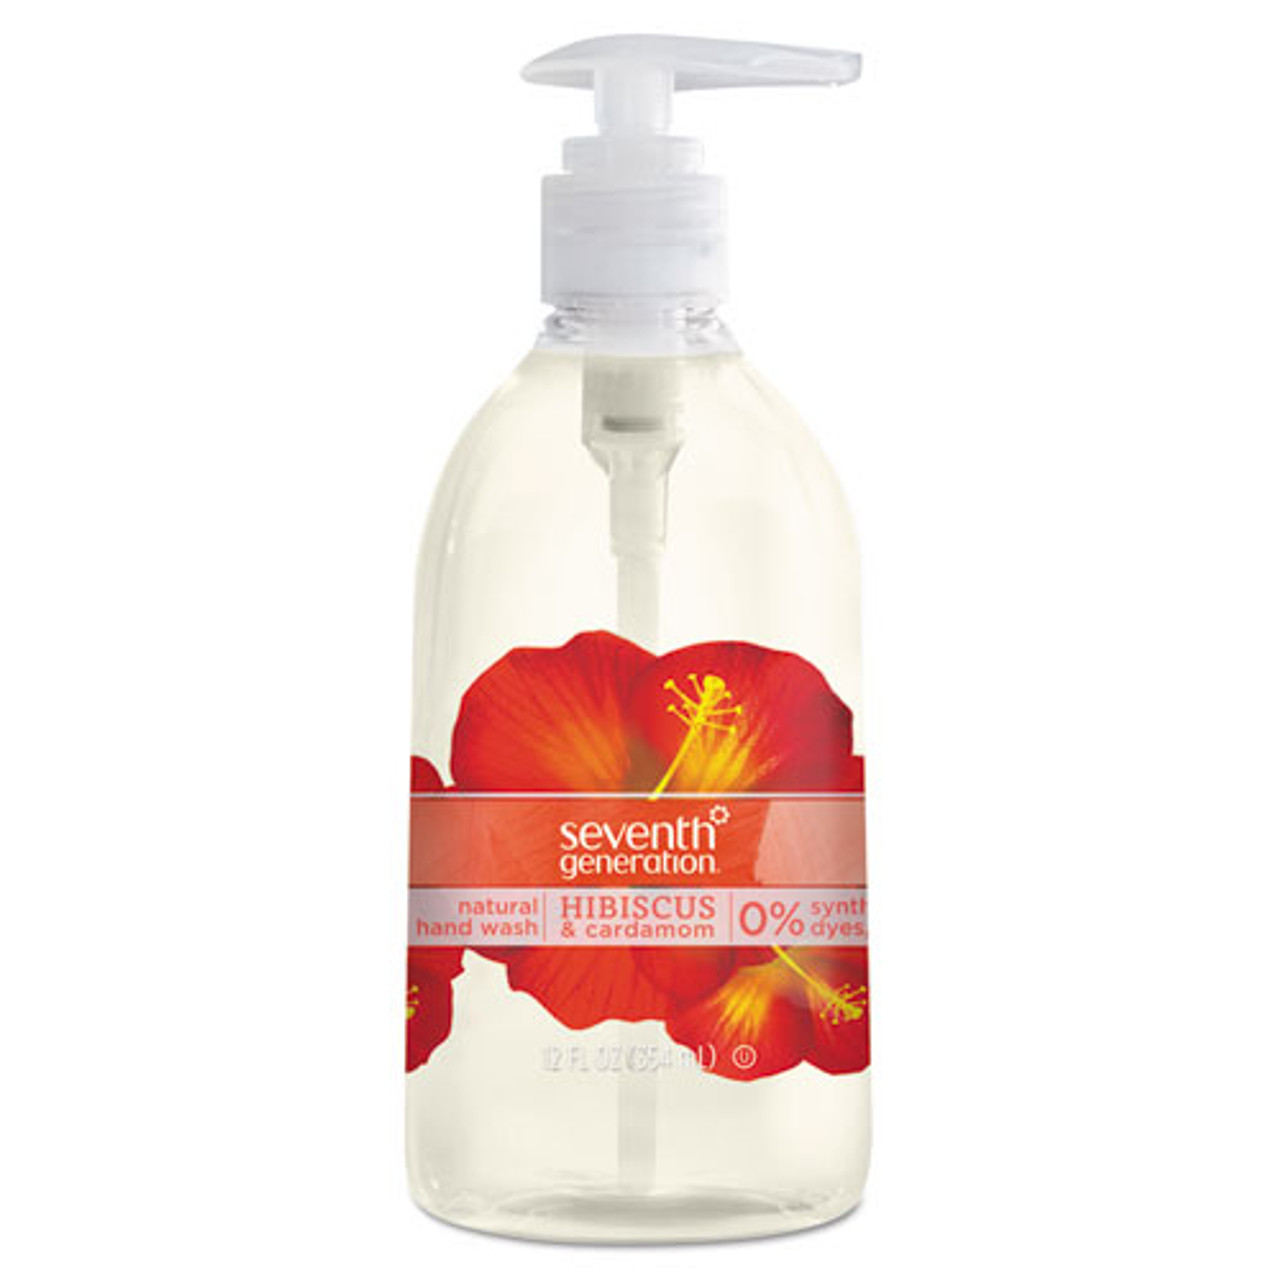 Natural Hand Wash, Hibiscus & Cardamom, 12 oz Pump Bottle